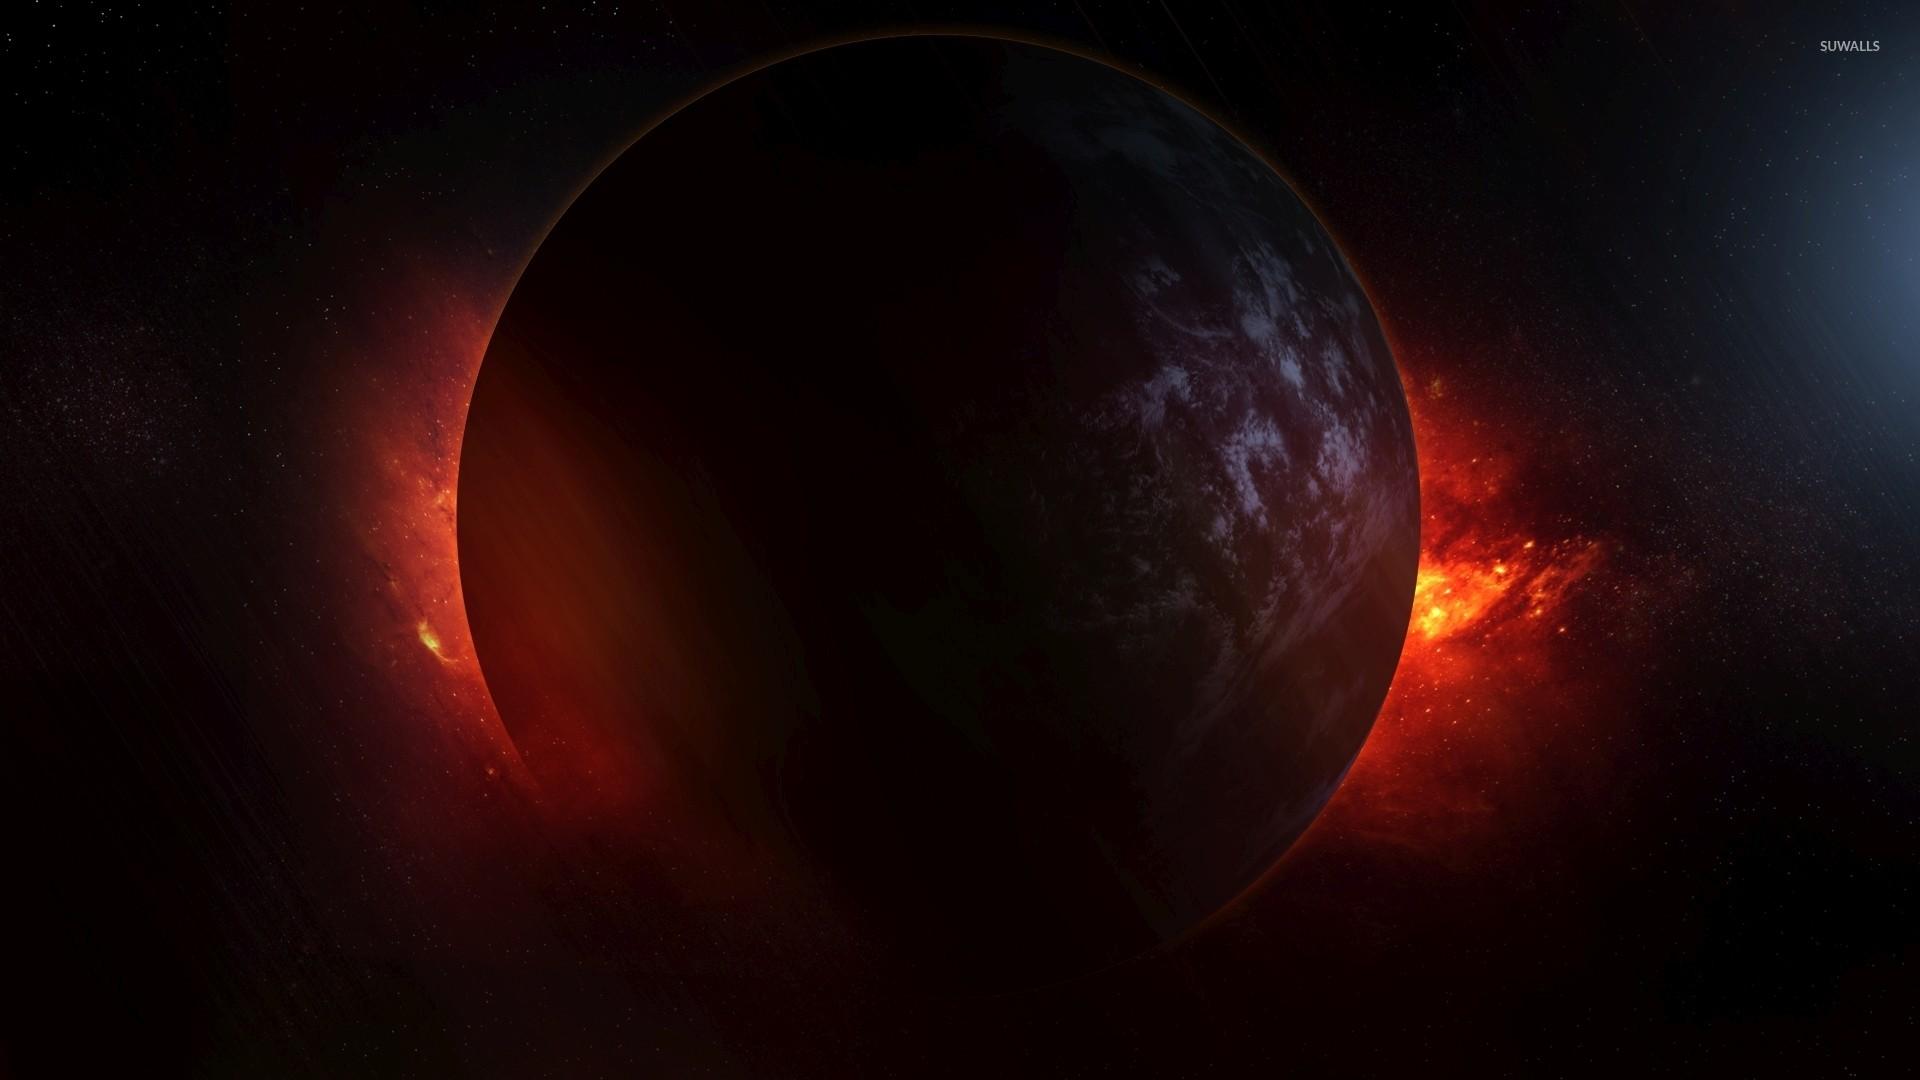 Red nebula hiding behind the dark planet wallpaper